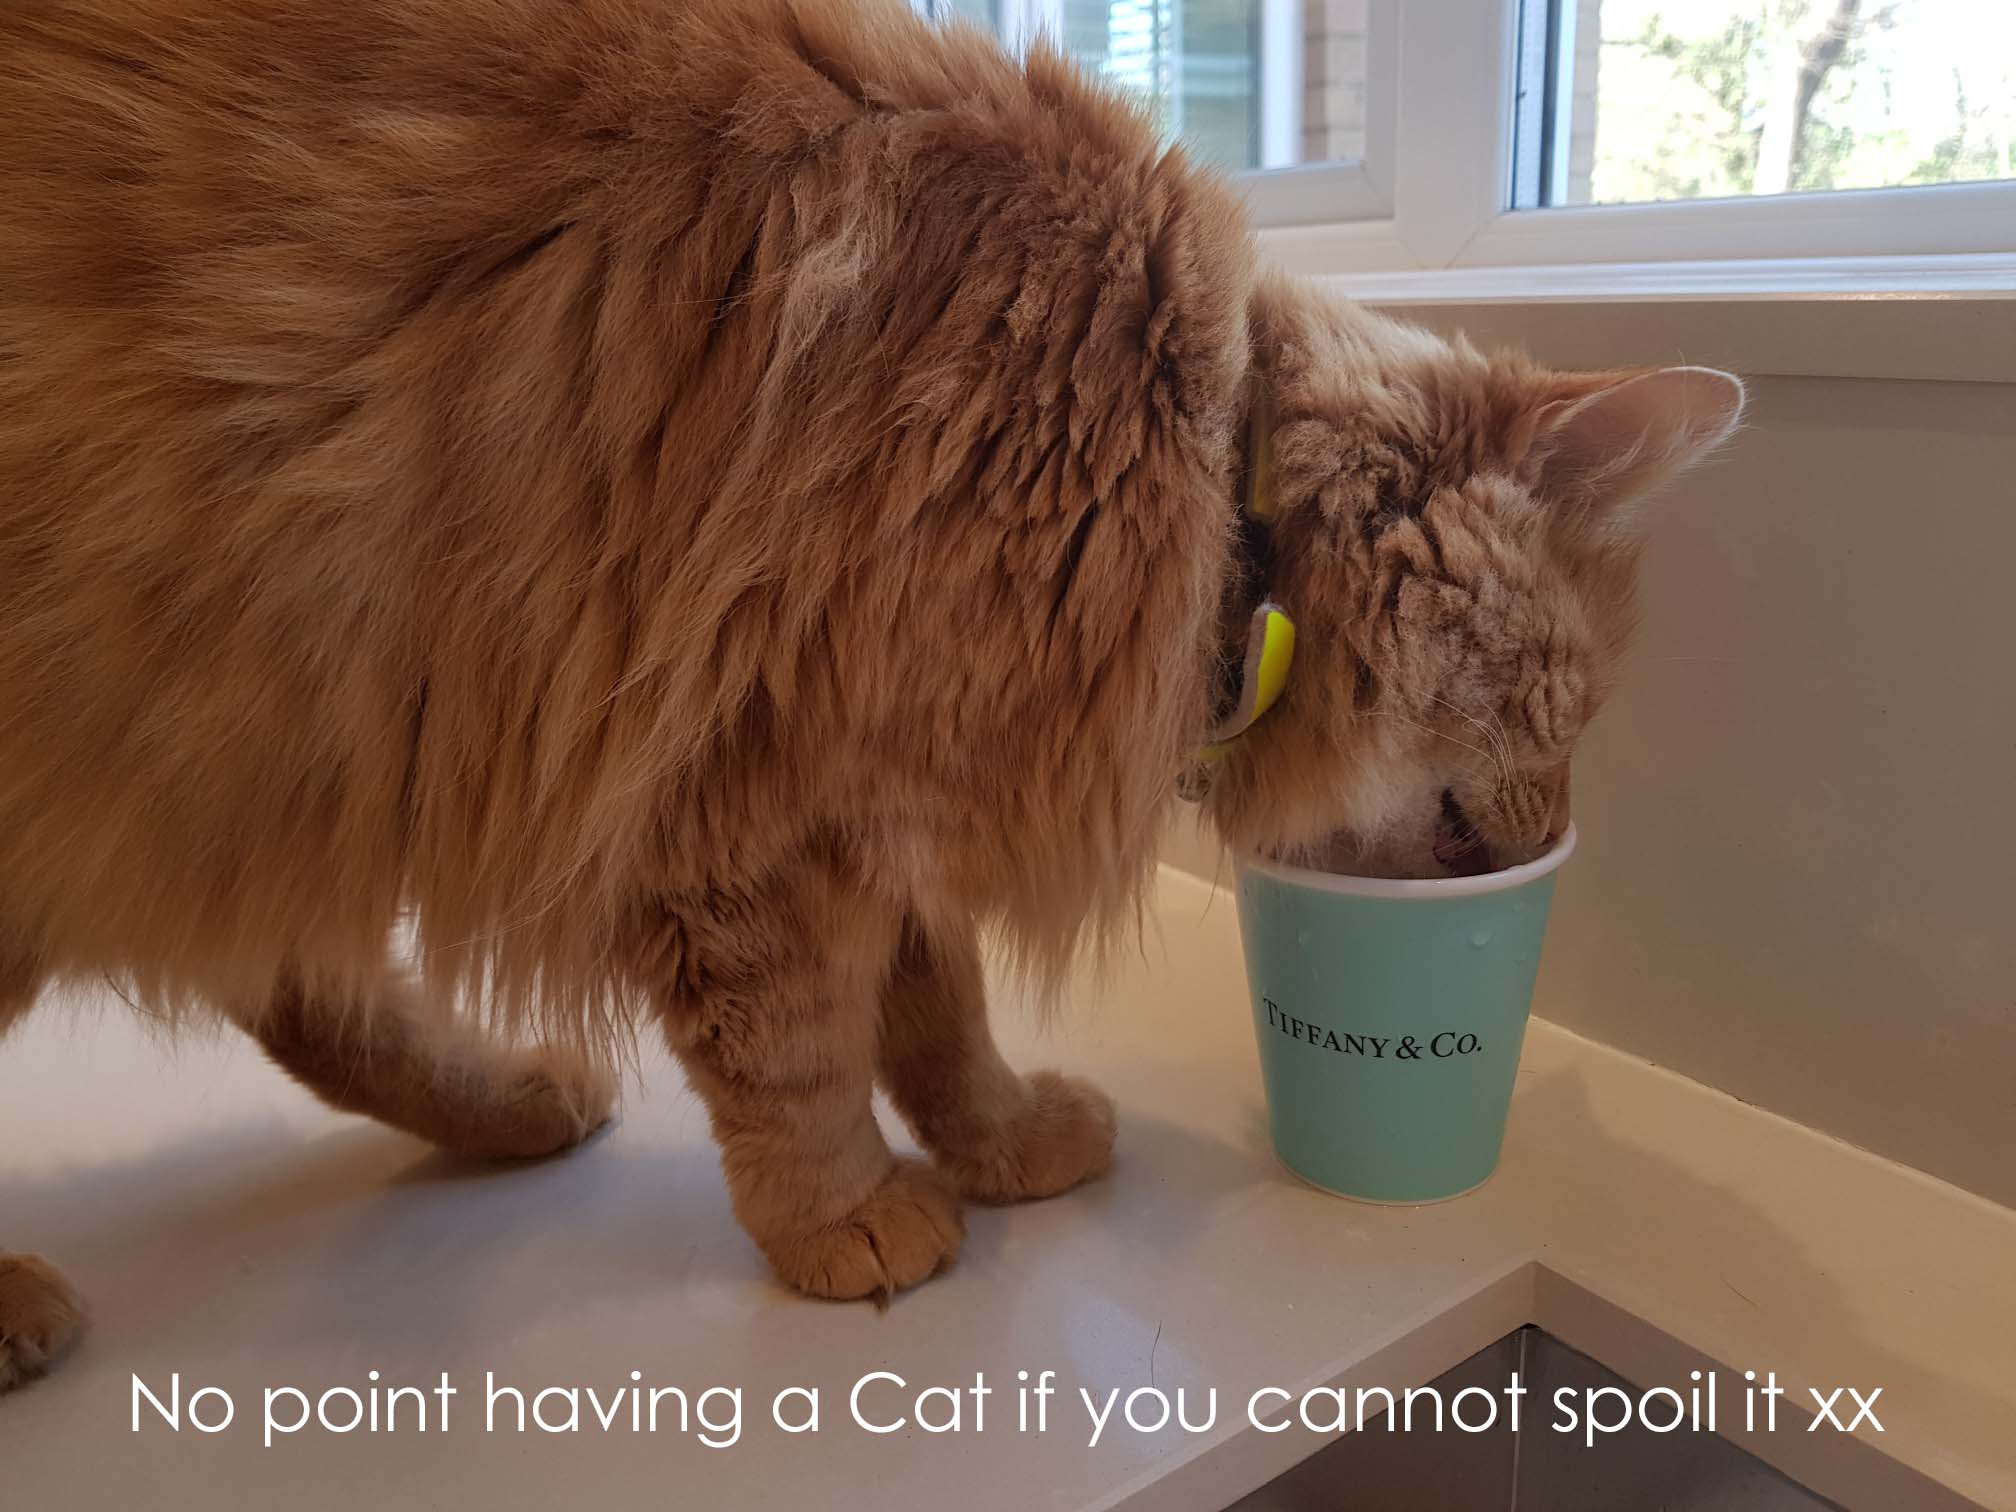 Spoil your Cat xx